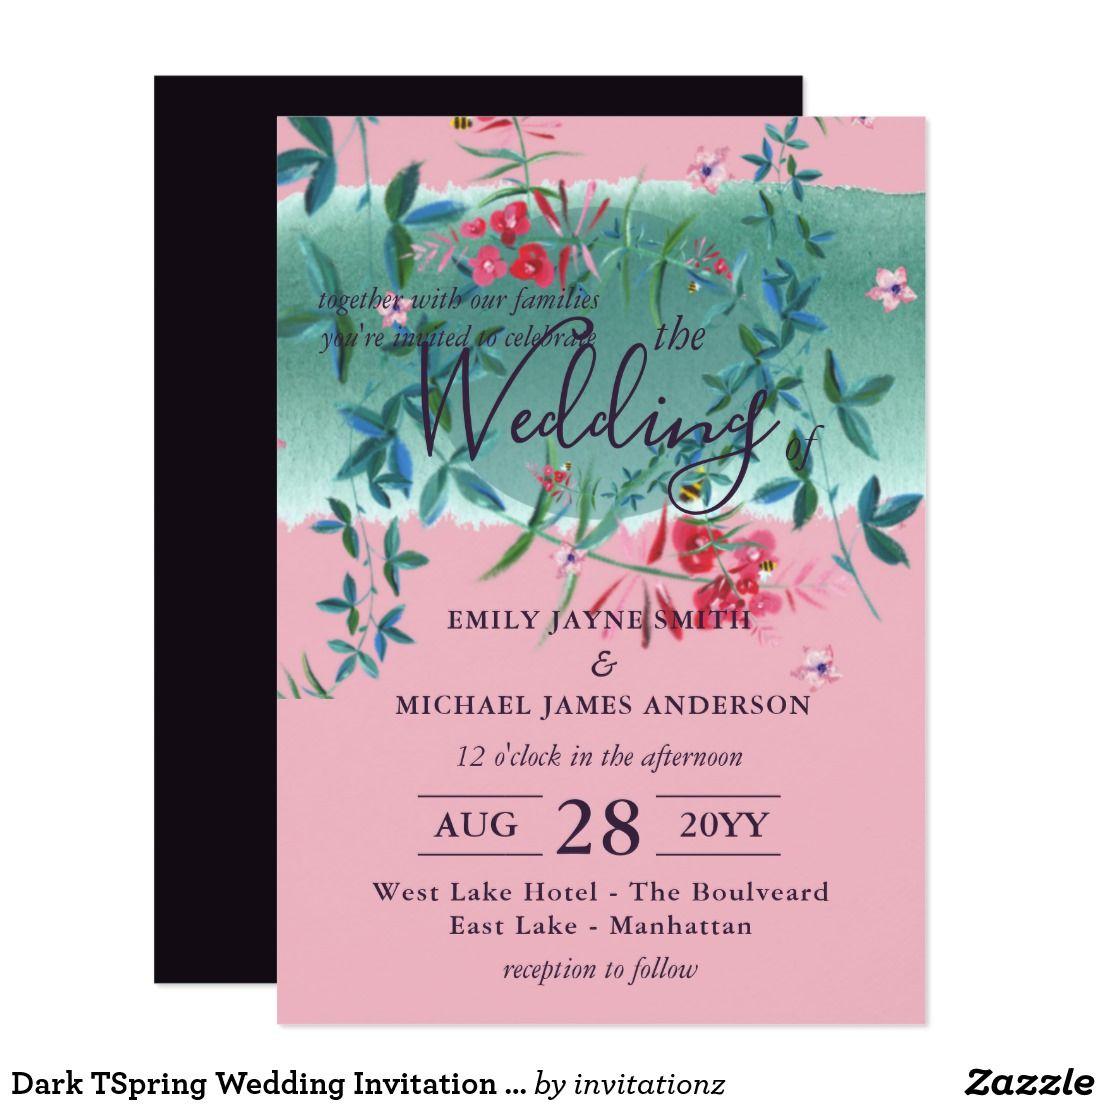 Dark TSpring Wedding Invitation Pink Purple Green | Trending Wedding ...